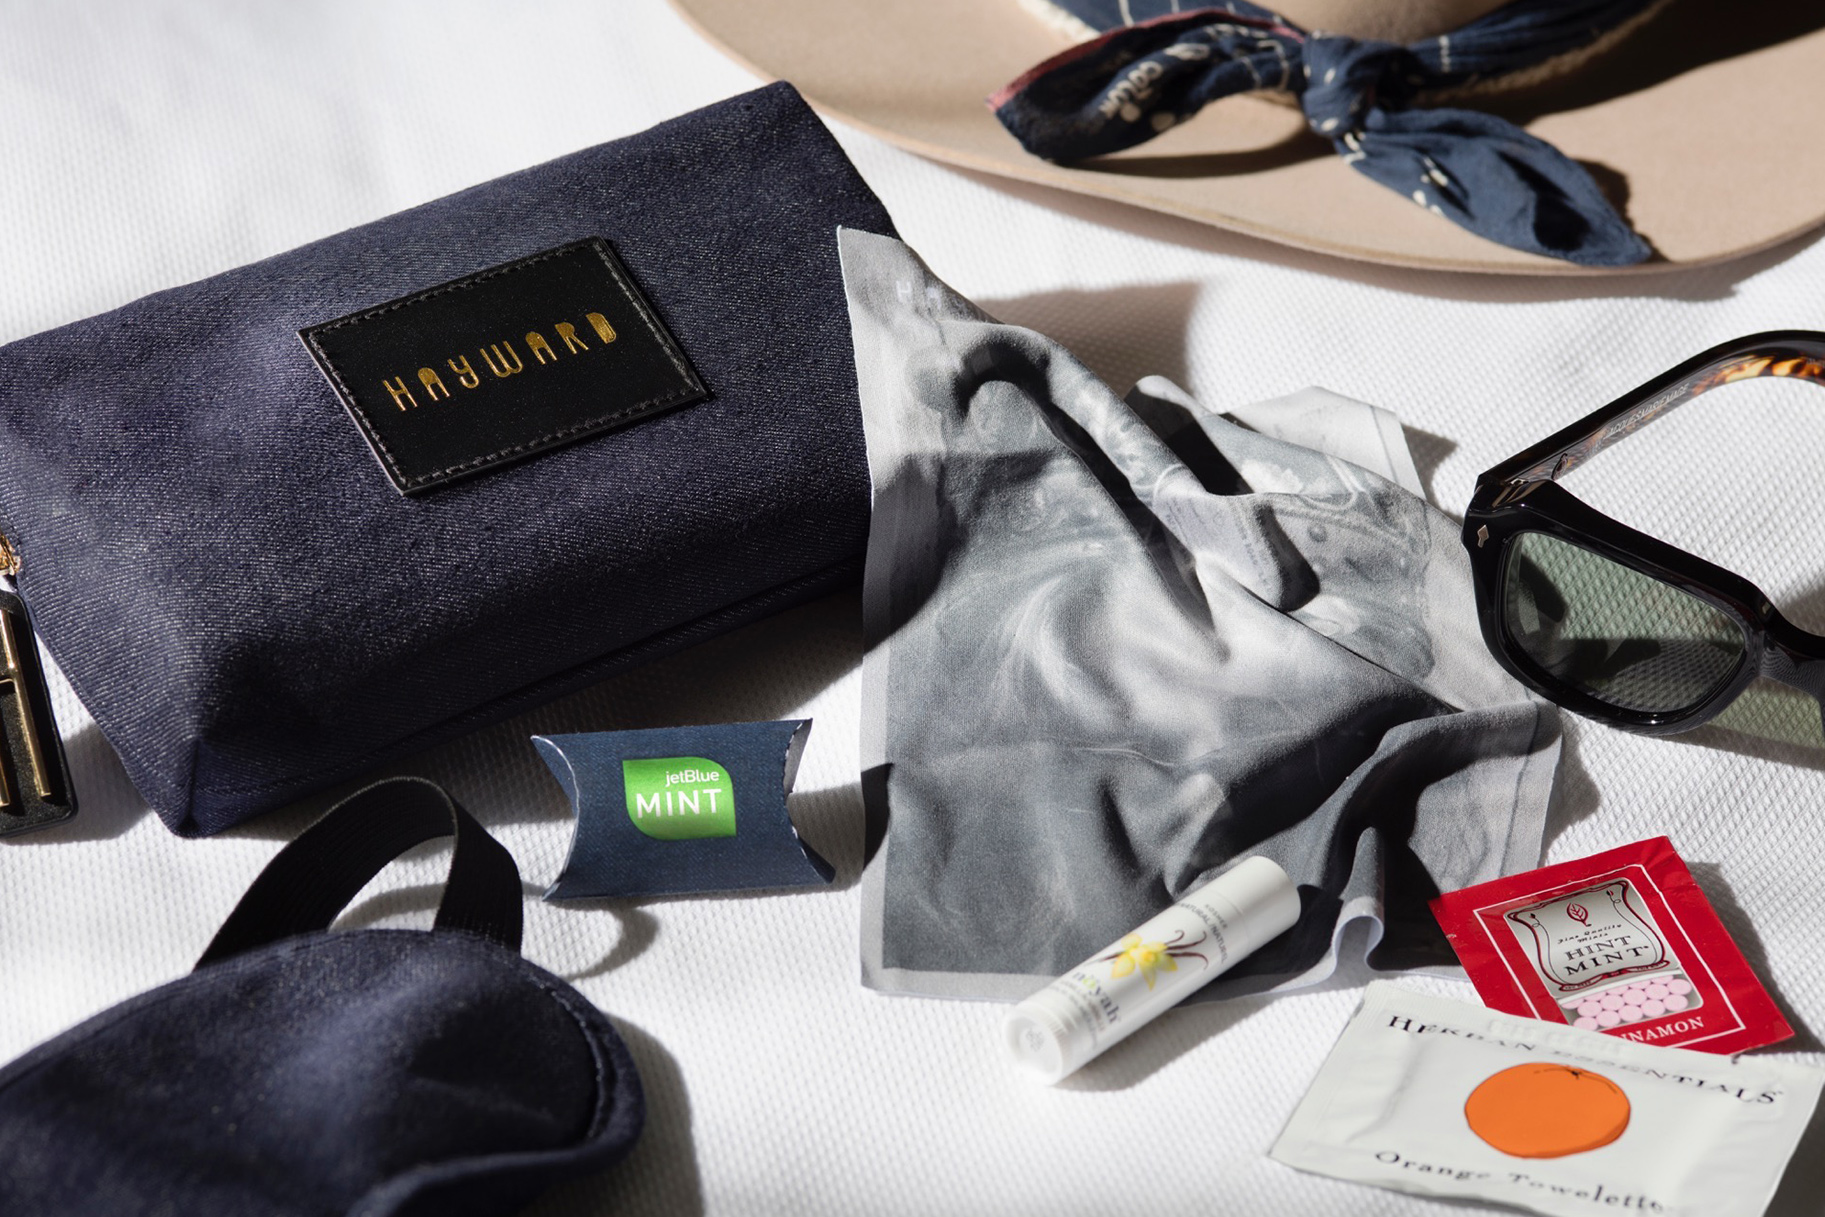 Initiative Delta One Tumi Travel Hard Case Amenity Kit Black Sealed Kiehls Monogramable Delta